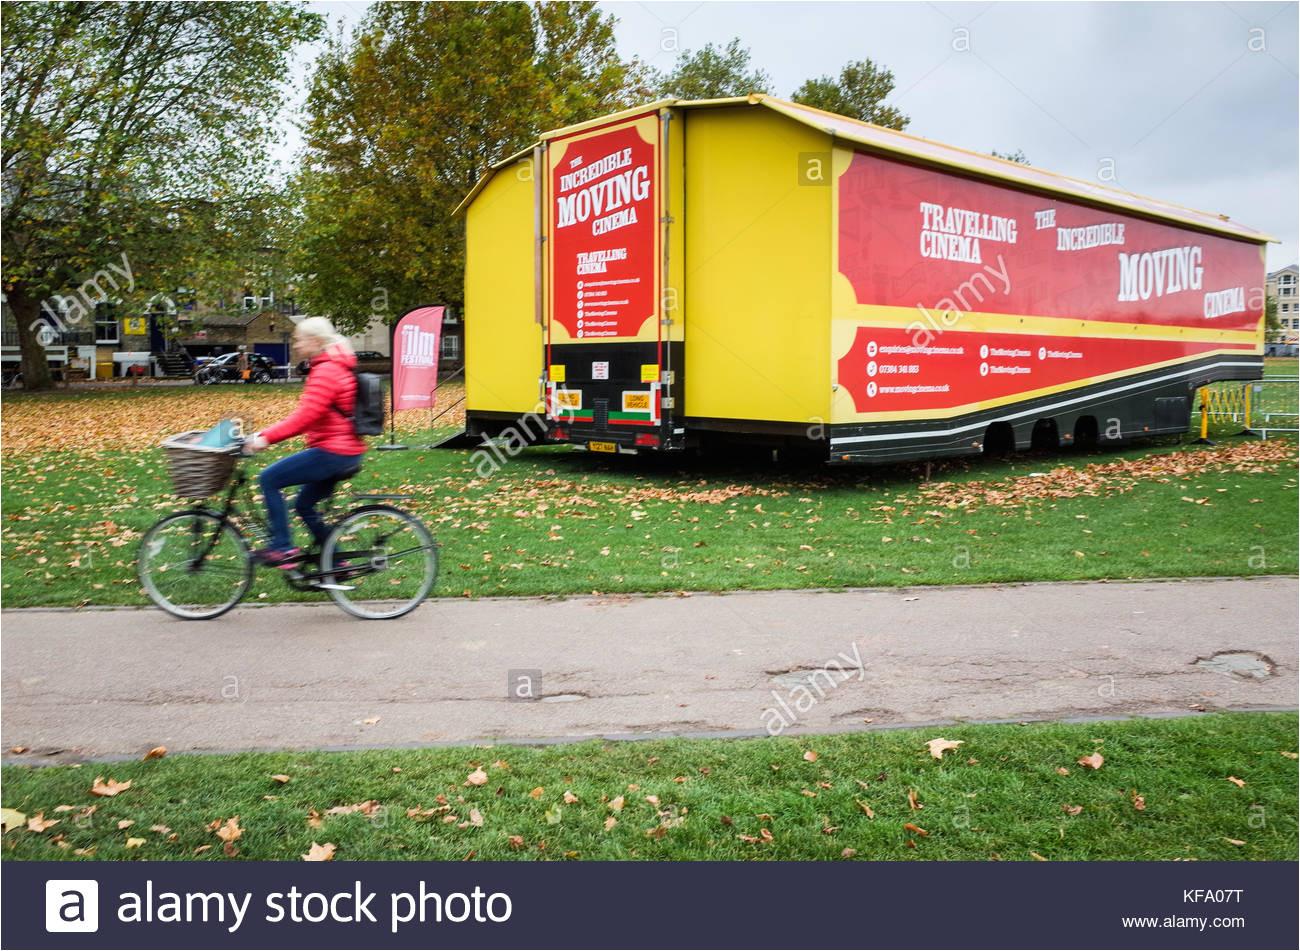 die unglaubliche mobiles kino im zentrum von cambridge fur die cambridge film festival stockbild